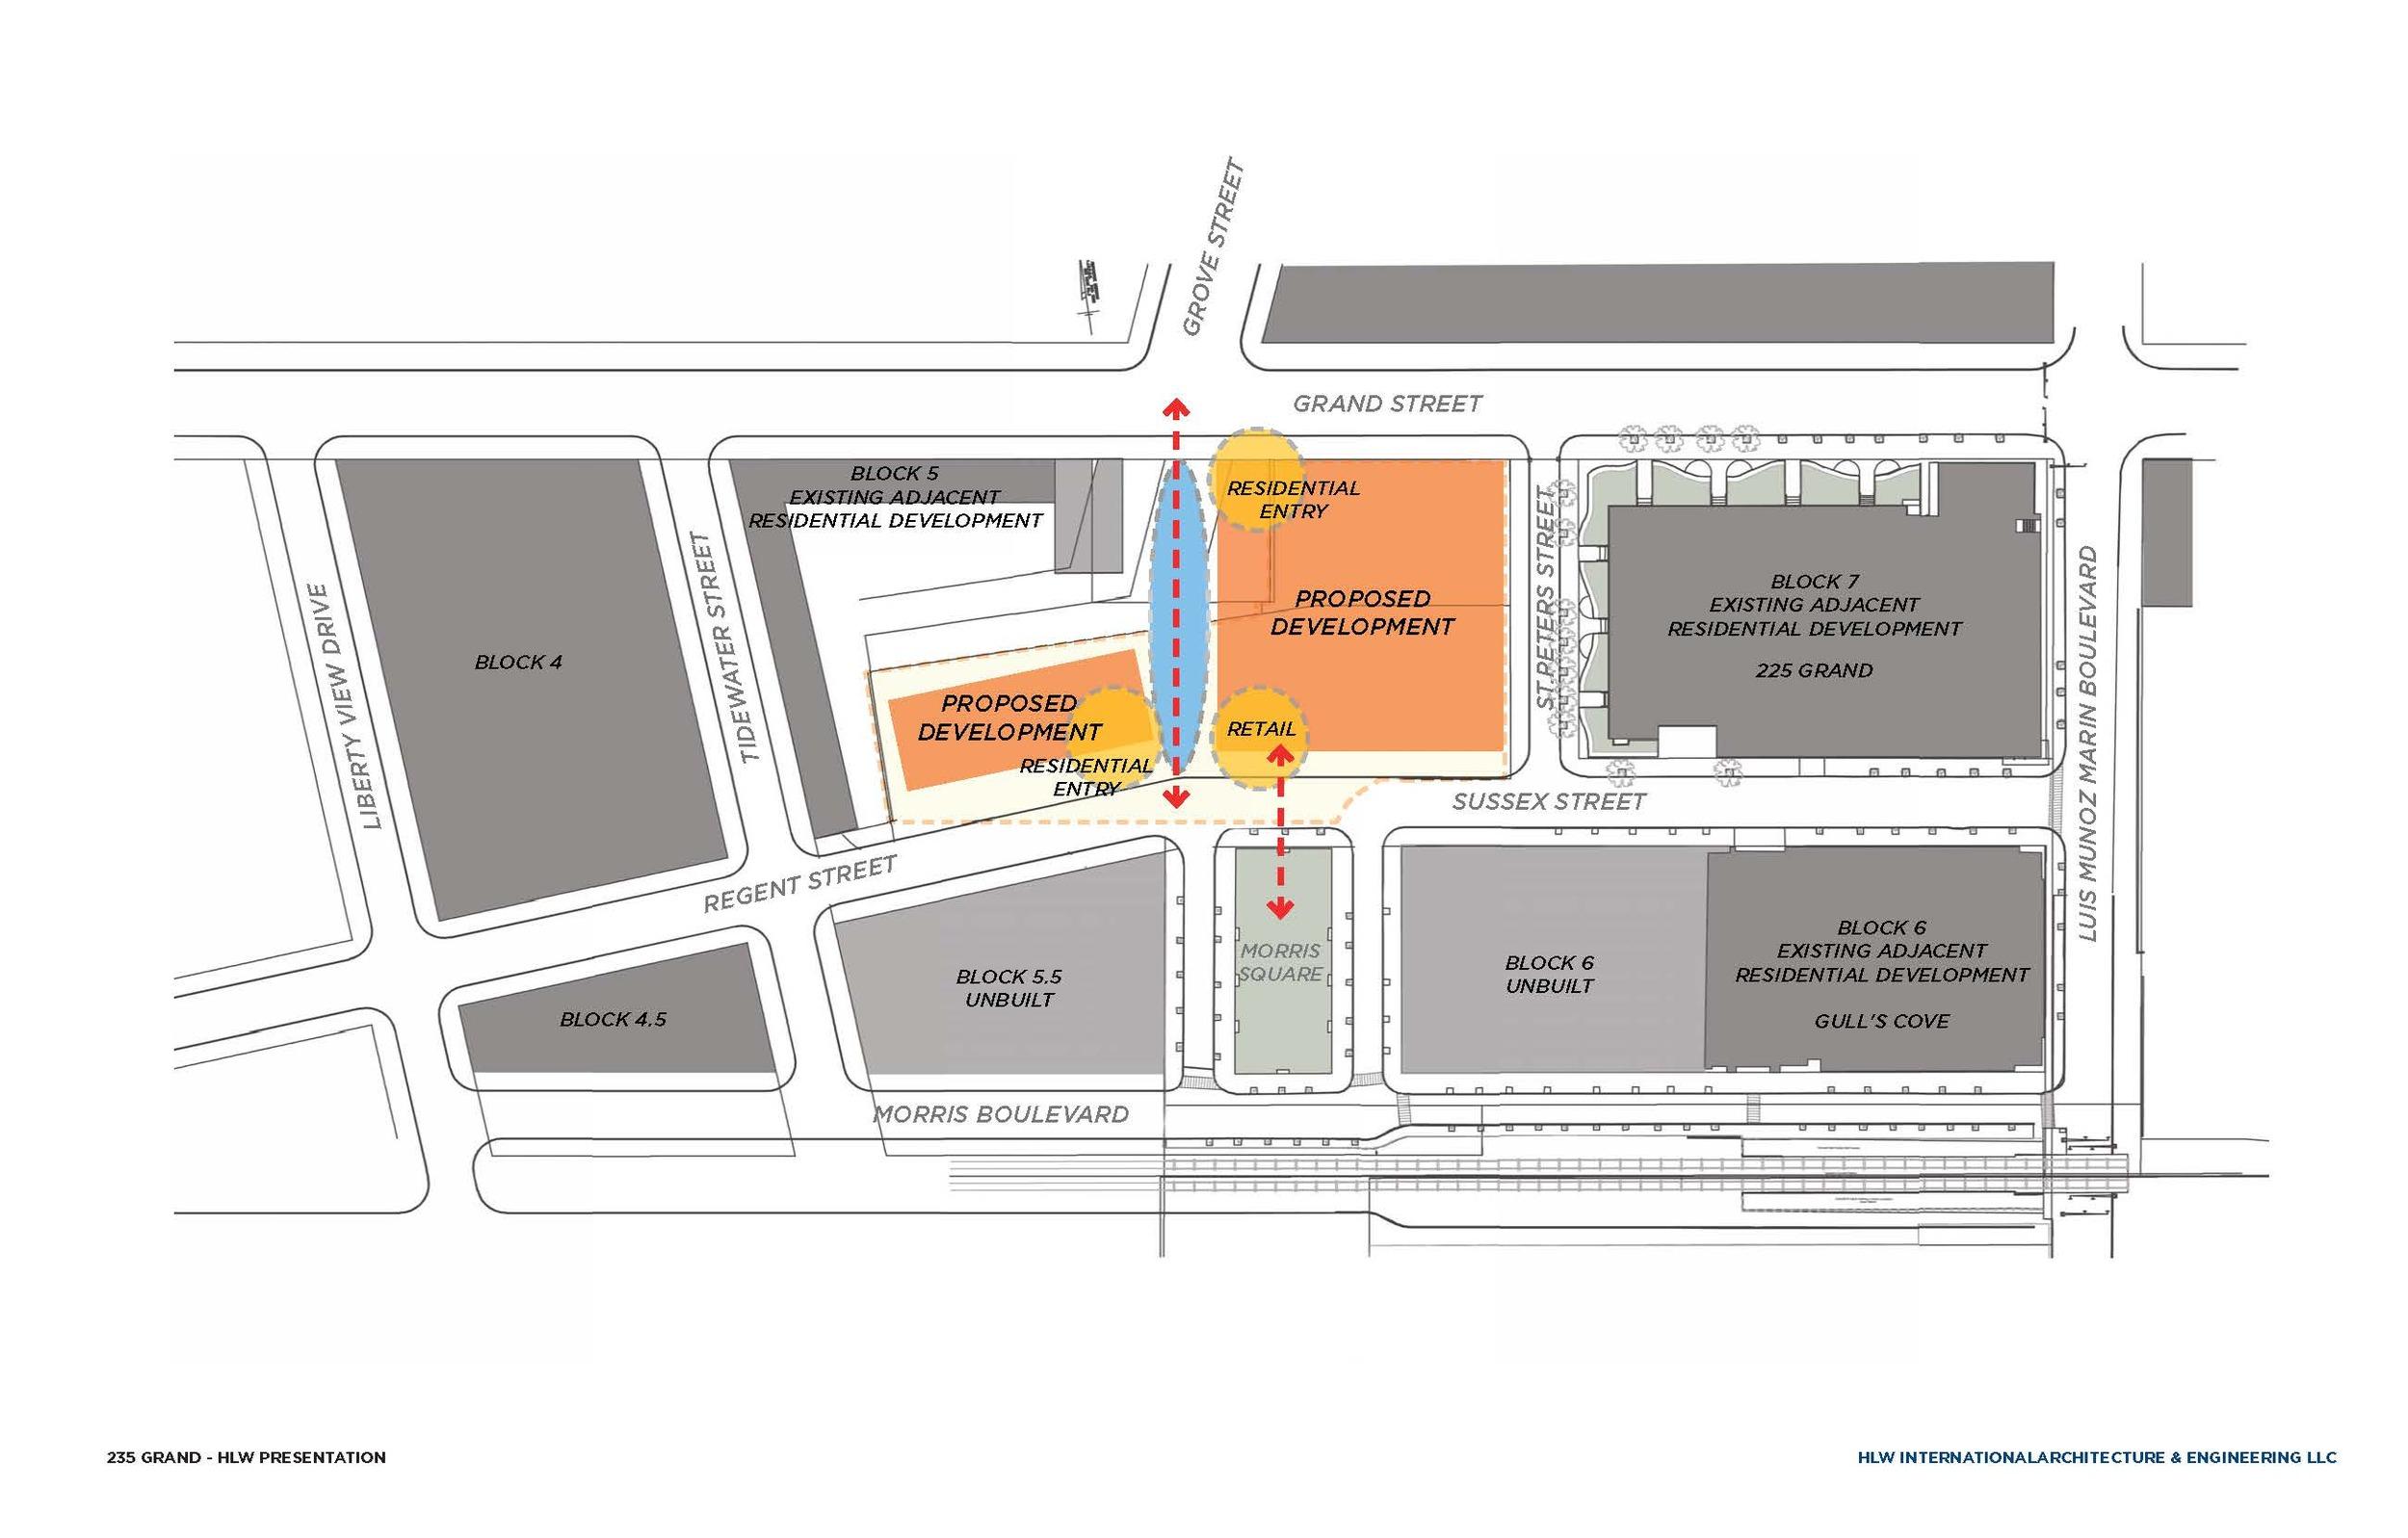 block 5 redevelopment-3